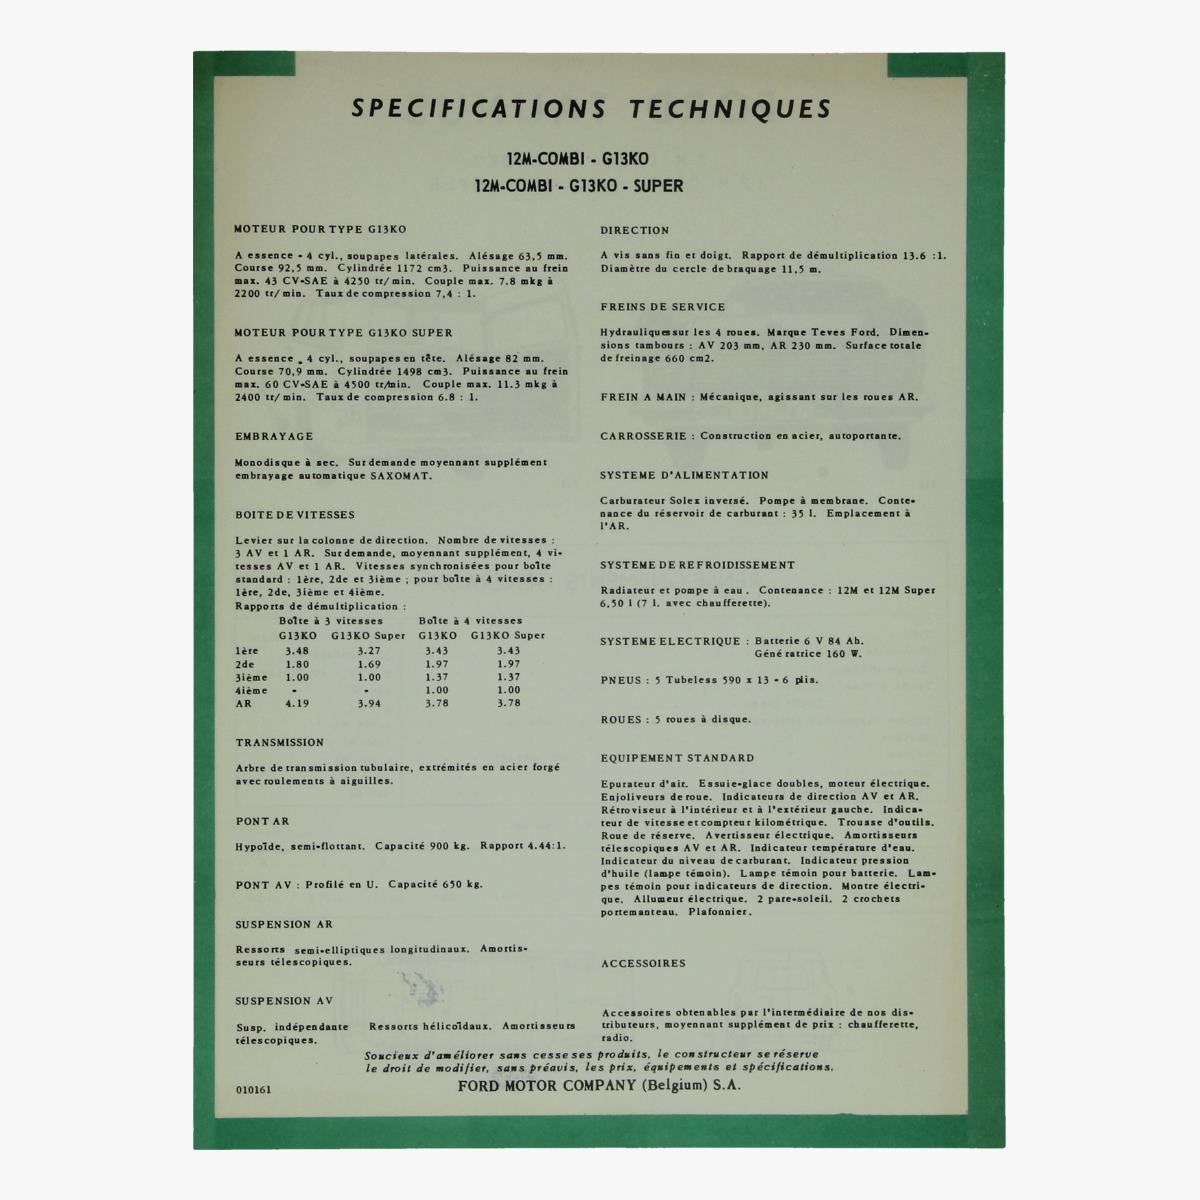 Afbeeldingen van specifications techniques ford taunus 12m combi - g13ko ford motor comp.